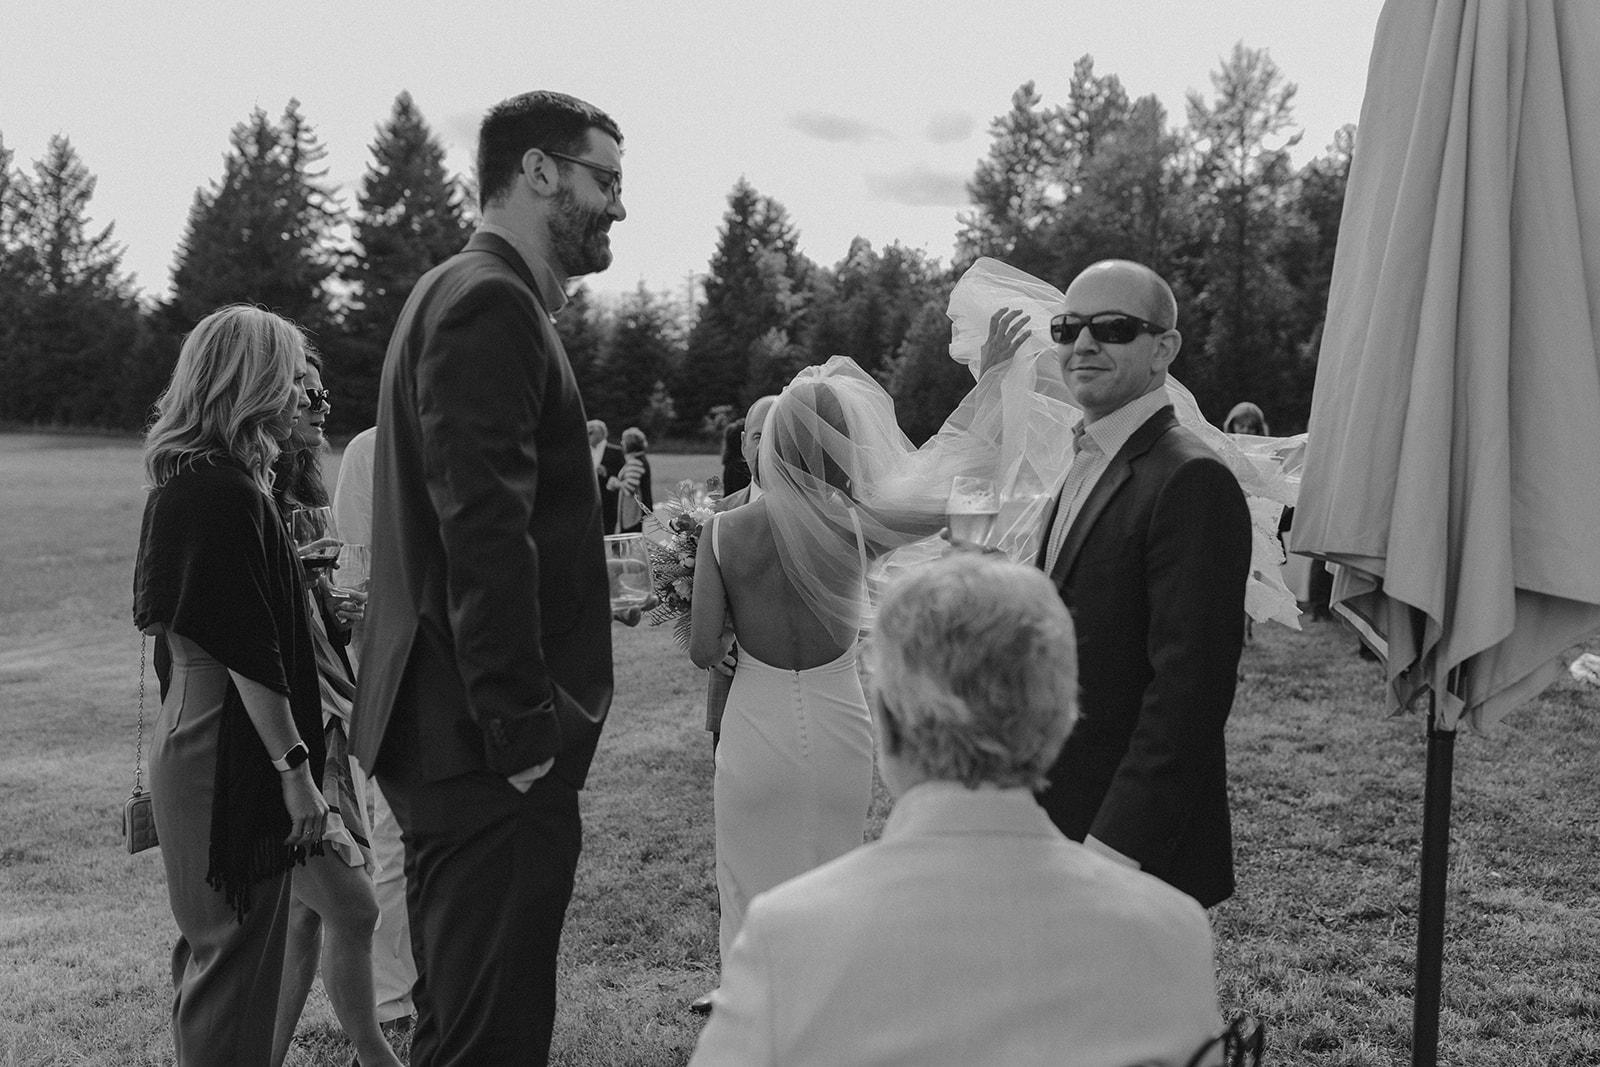 cortney_skye_wedding_june2019-504.jpg